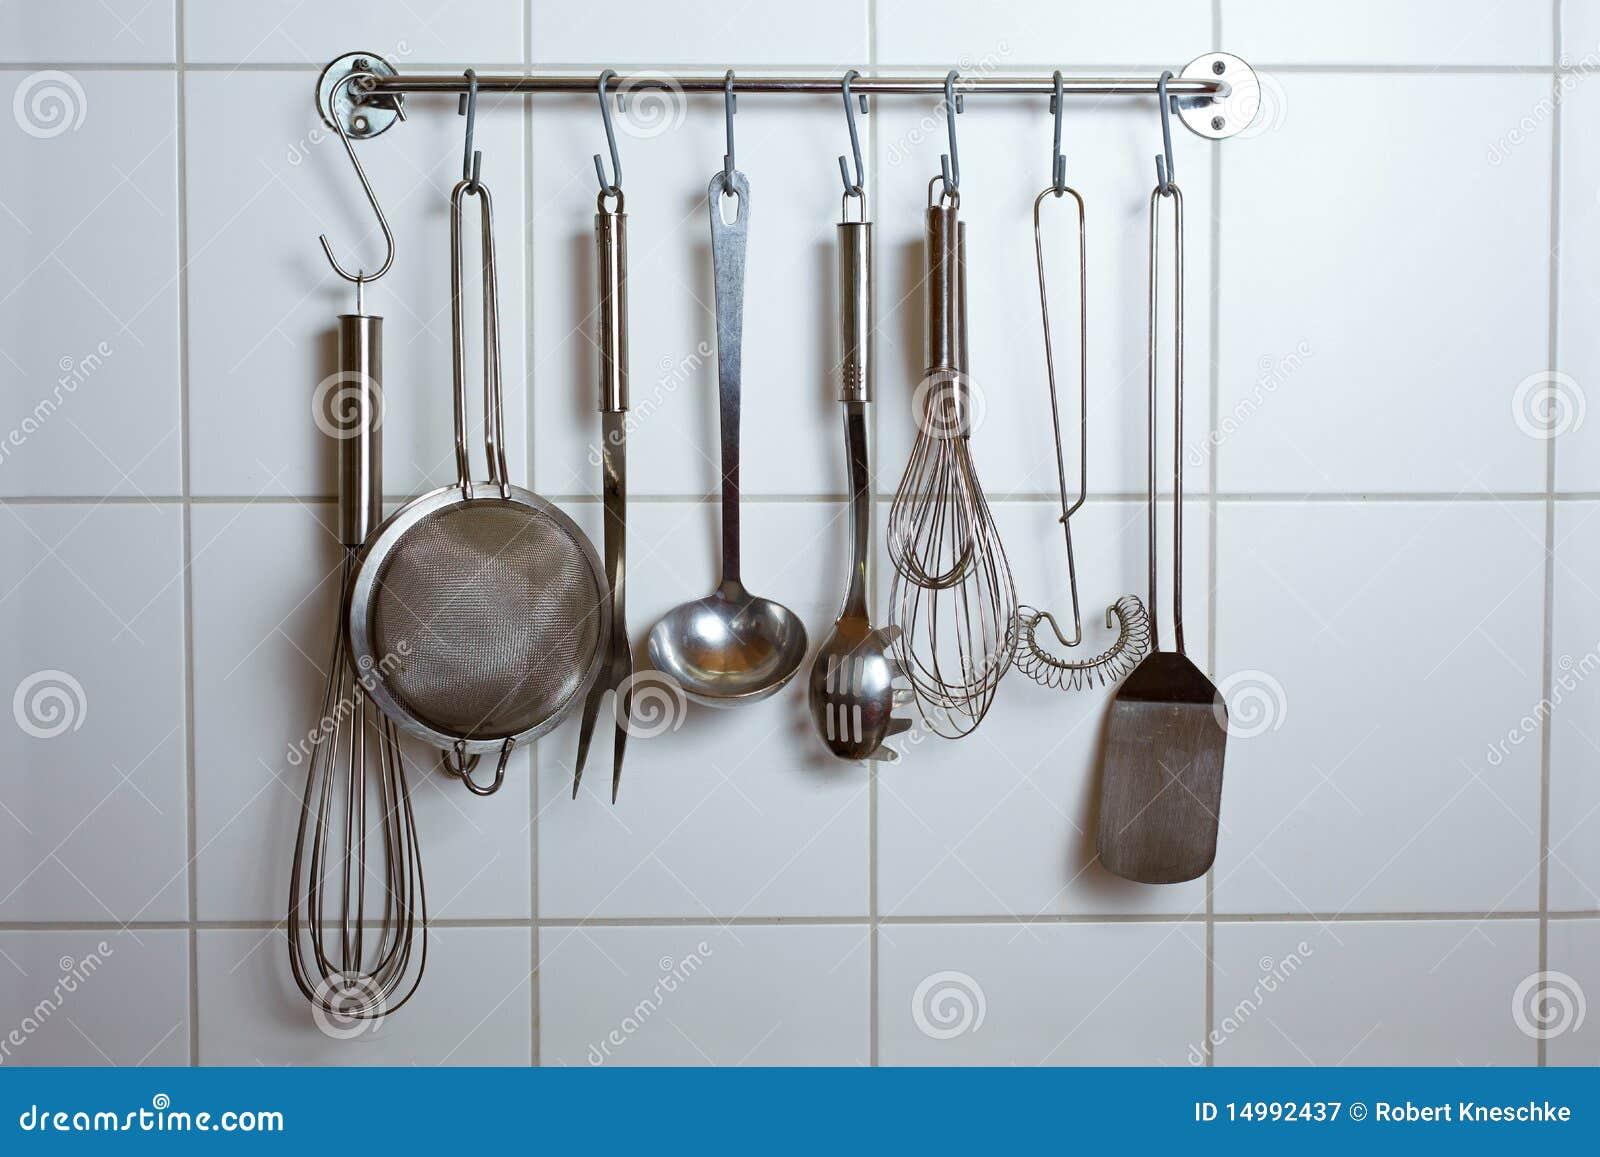 outils de cuisine image stock image du ustensiles personne 14992437. Black Bedroom Furniture Sets. Home Design Ideas